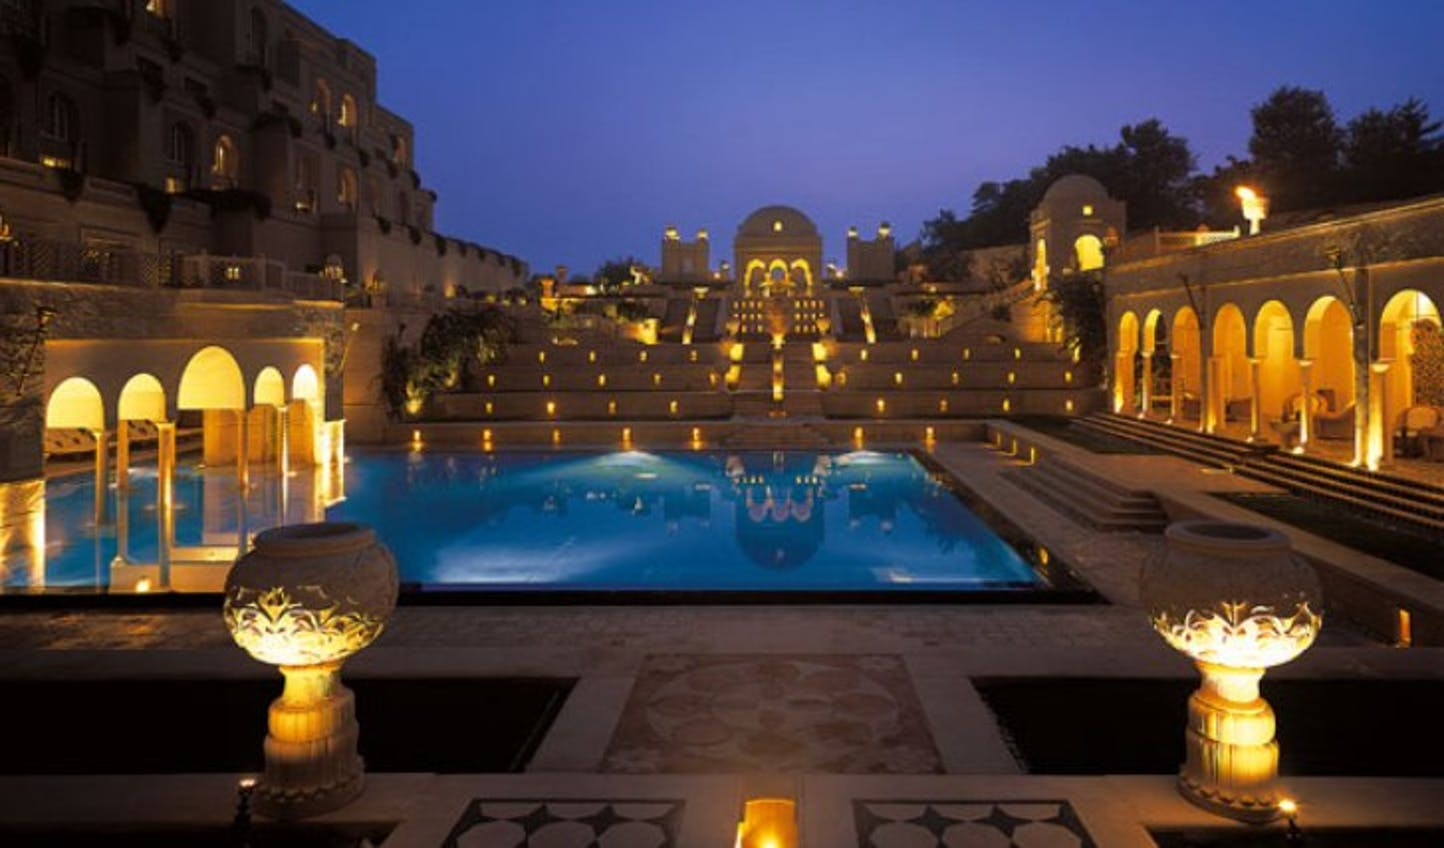 Stunning pool areas lit up at night at Amarvilla, Agra, India